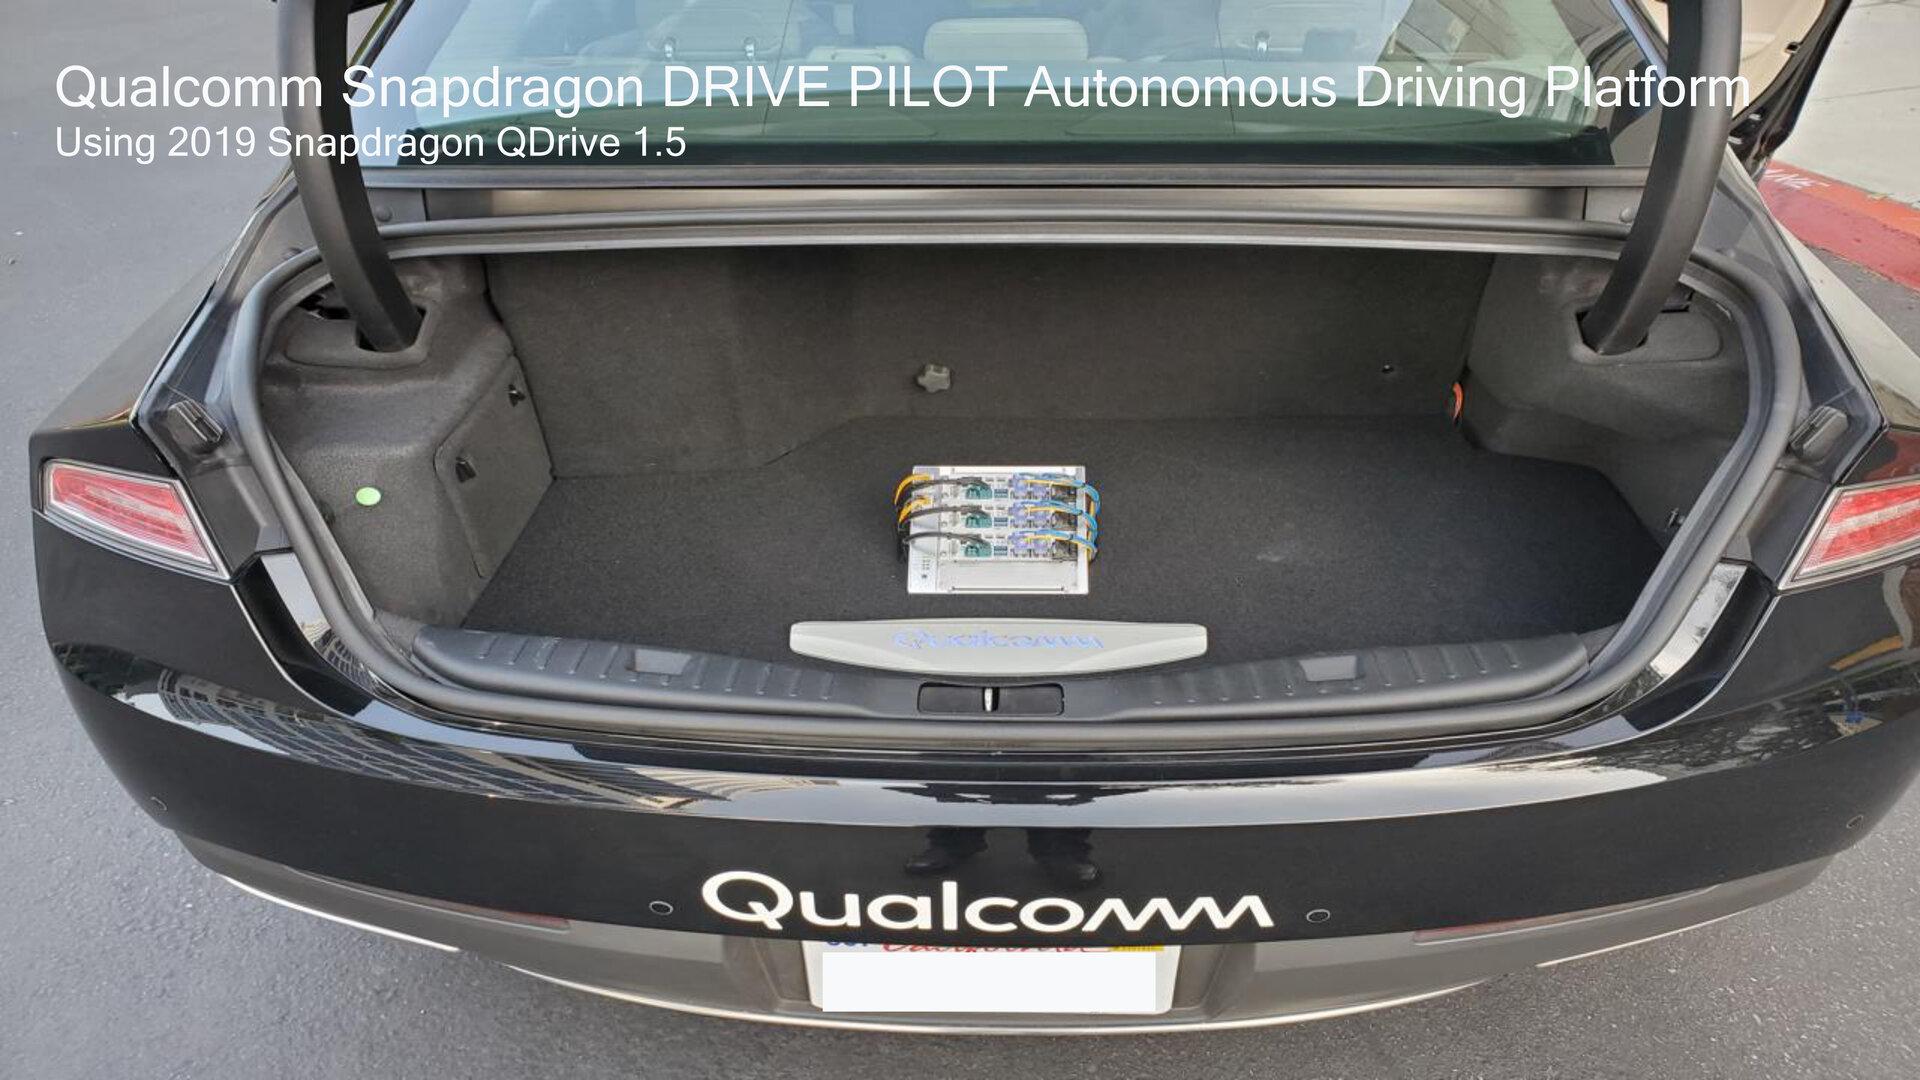 Der Snapdragon Drive Pilot soll besonders kompakt sein